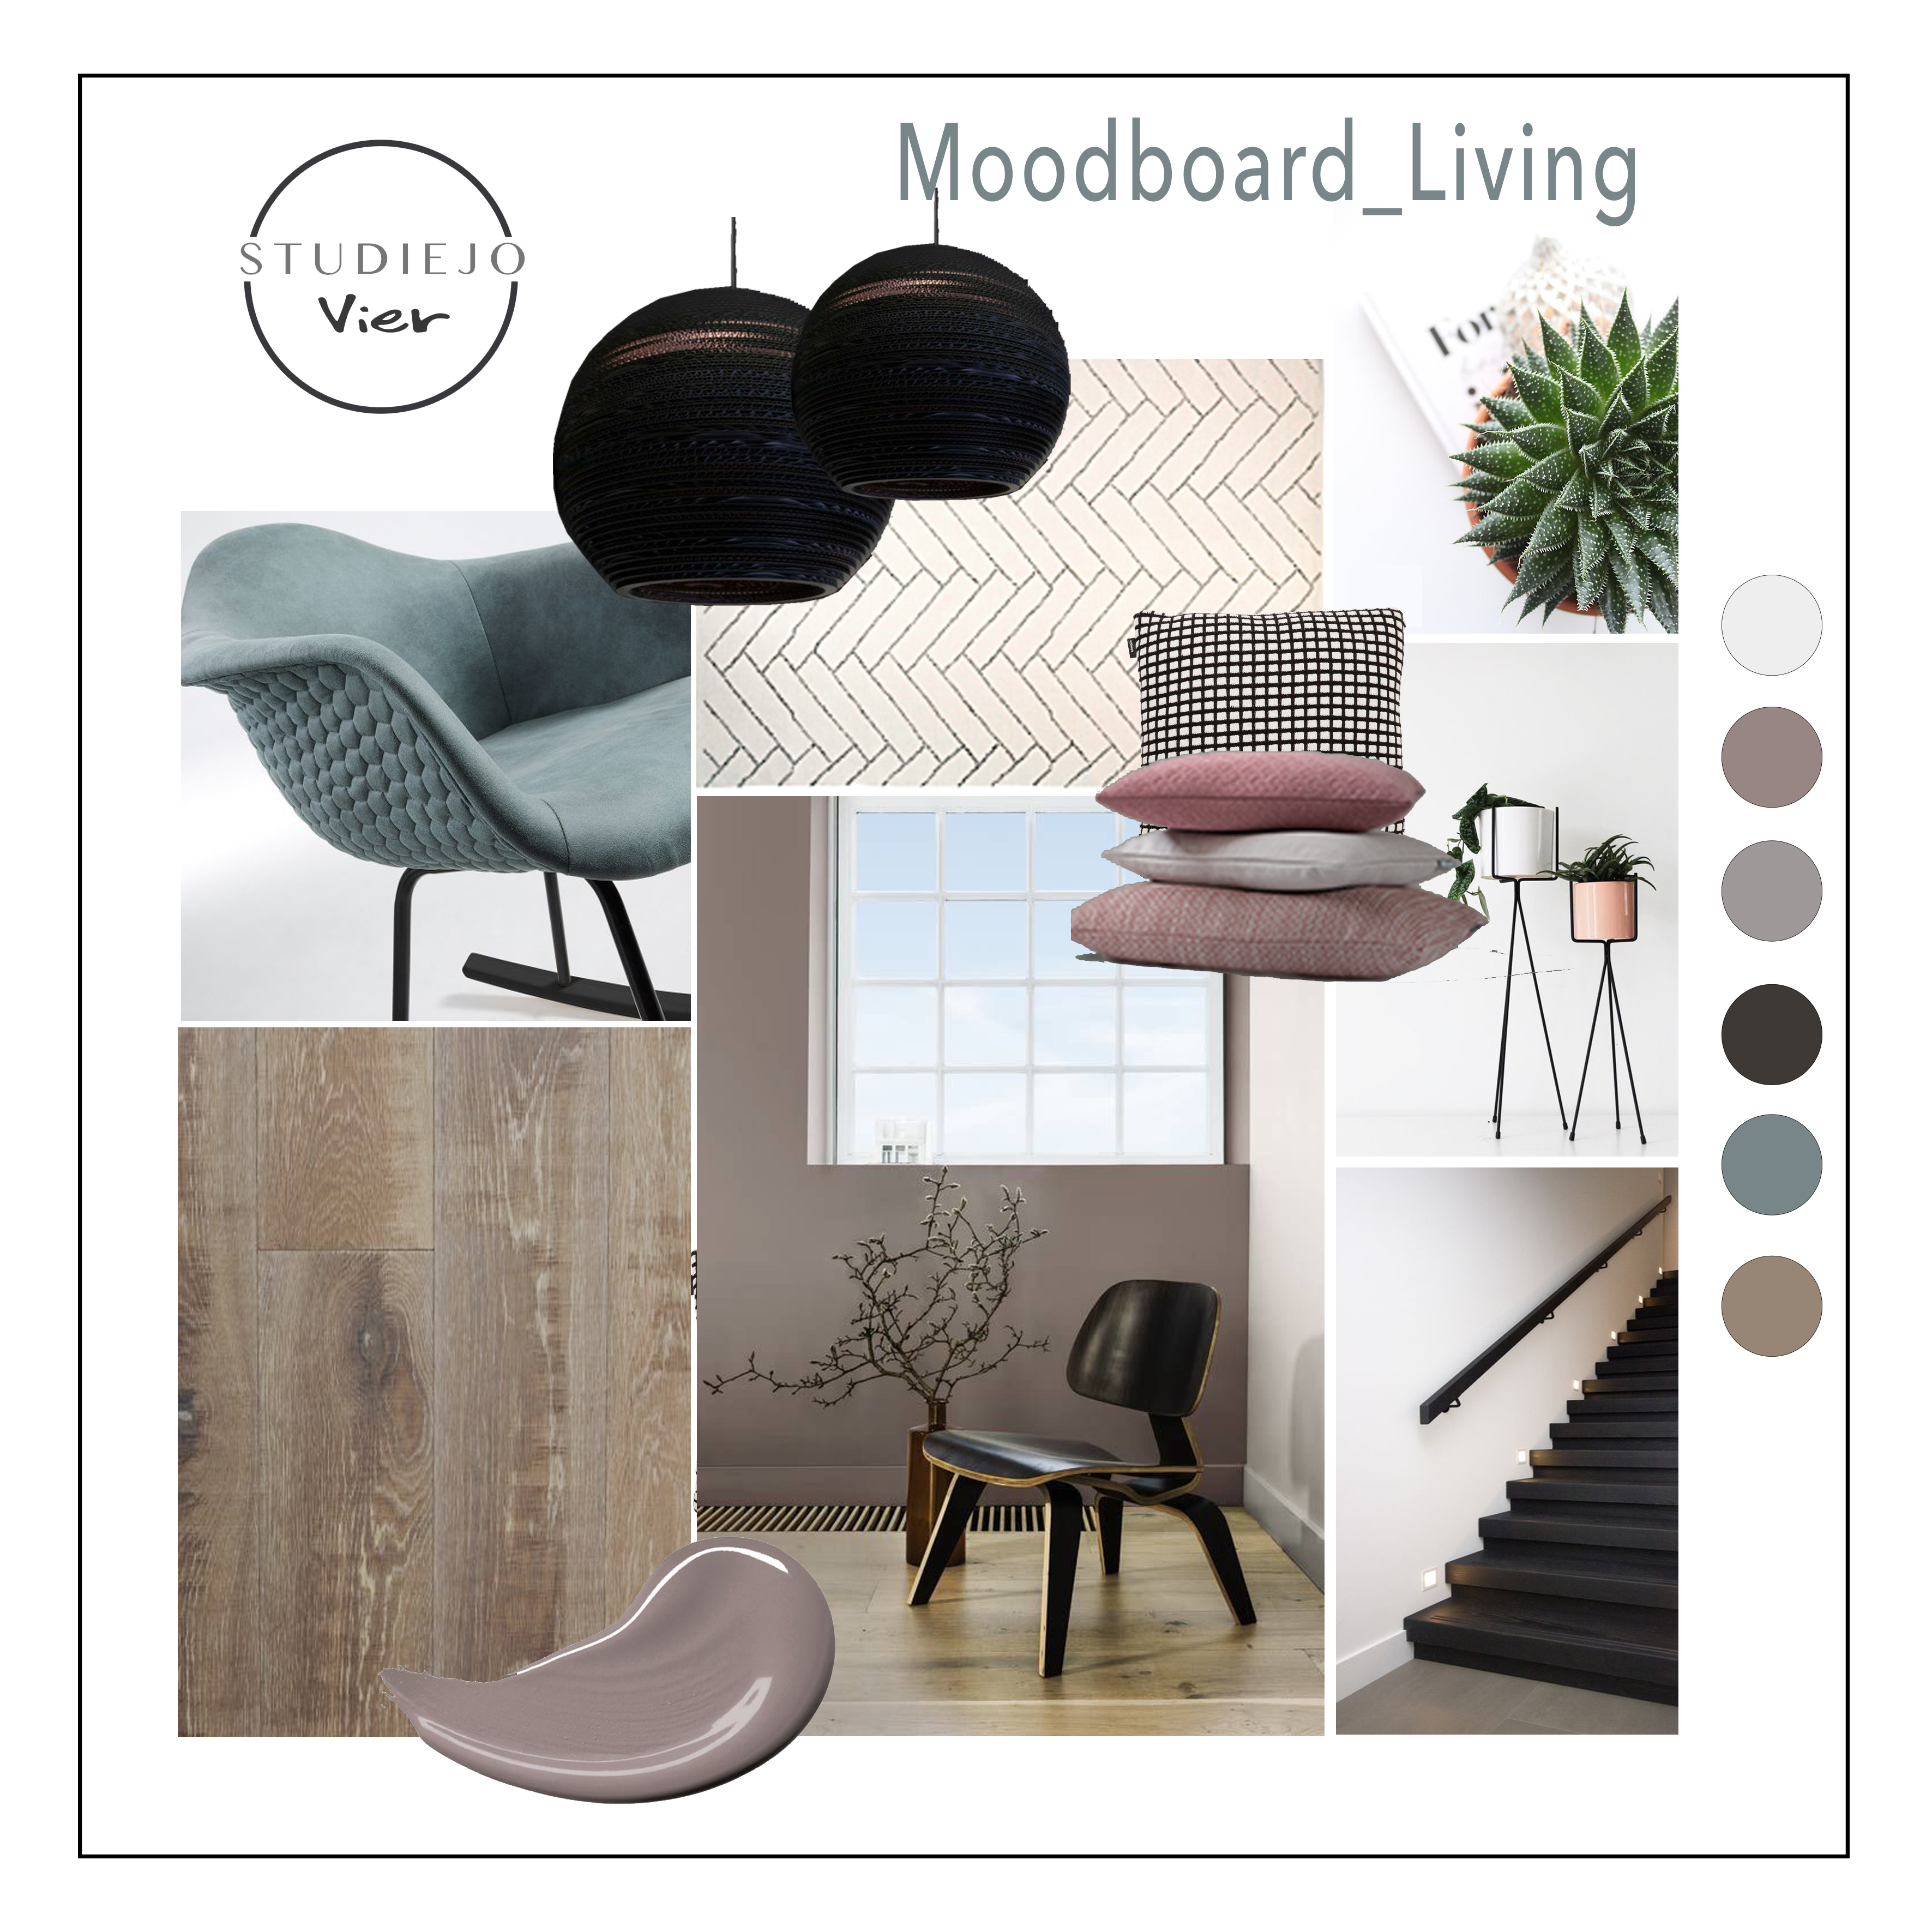 Moodboard_Living_2